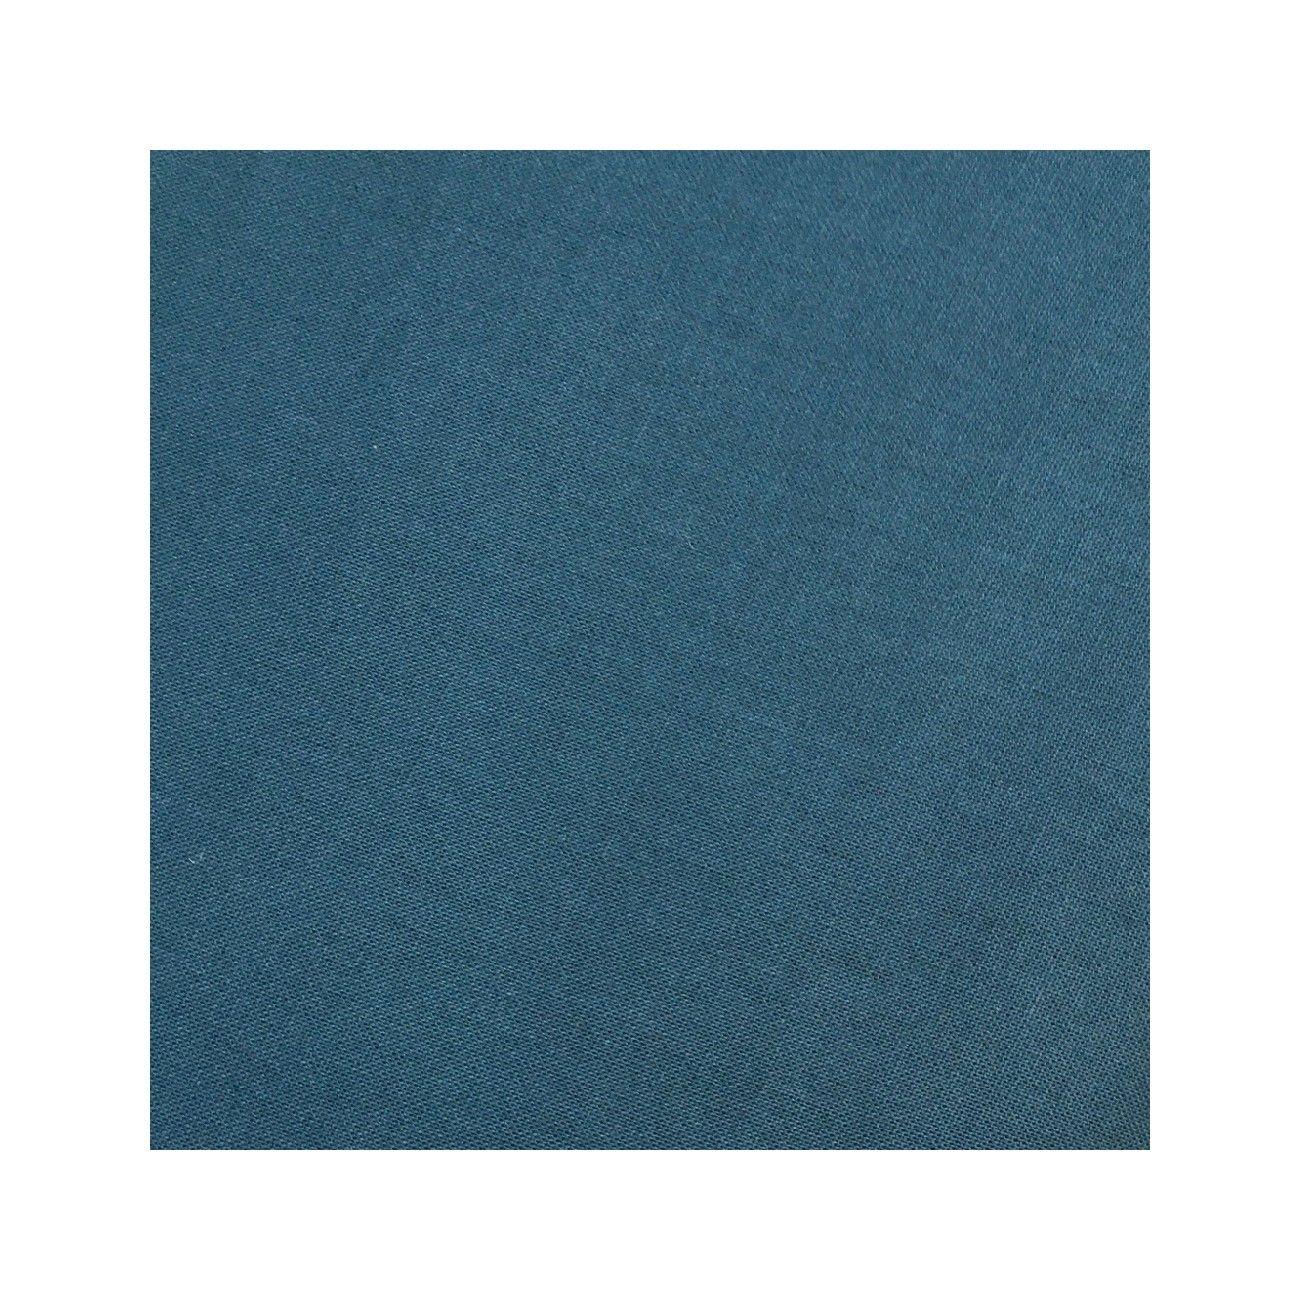 Tissu coton uni vert paon - 1